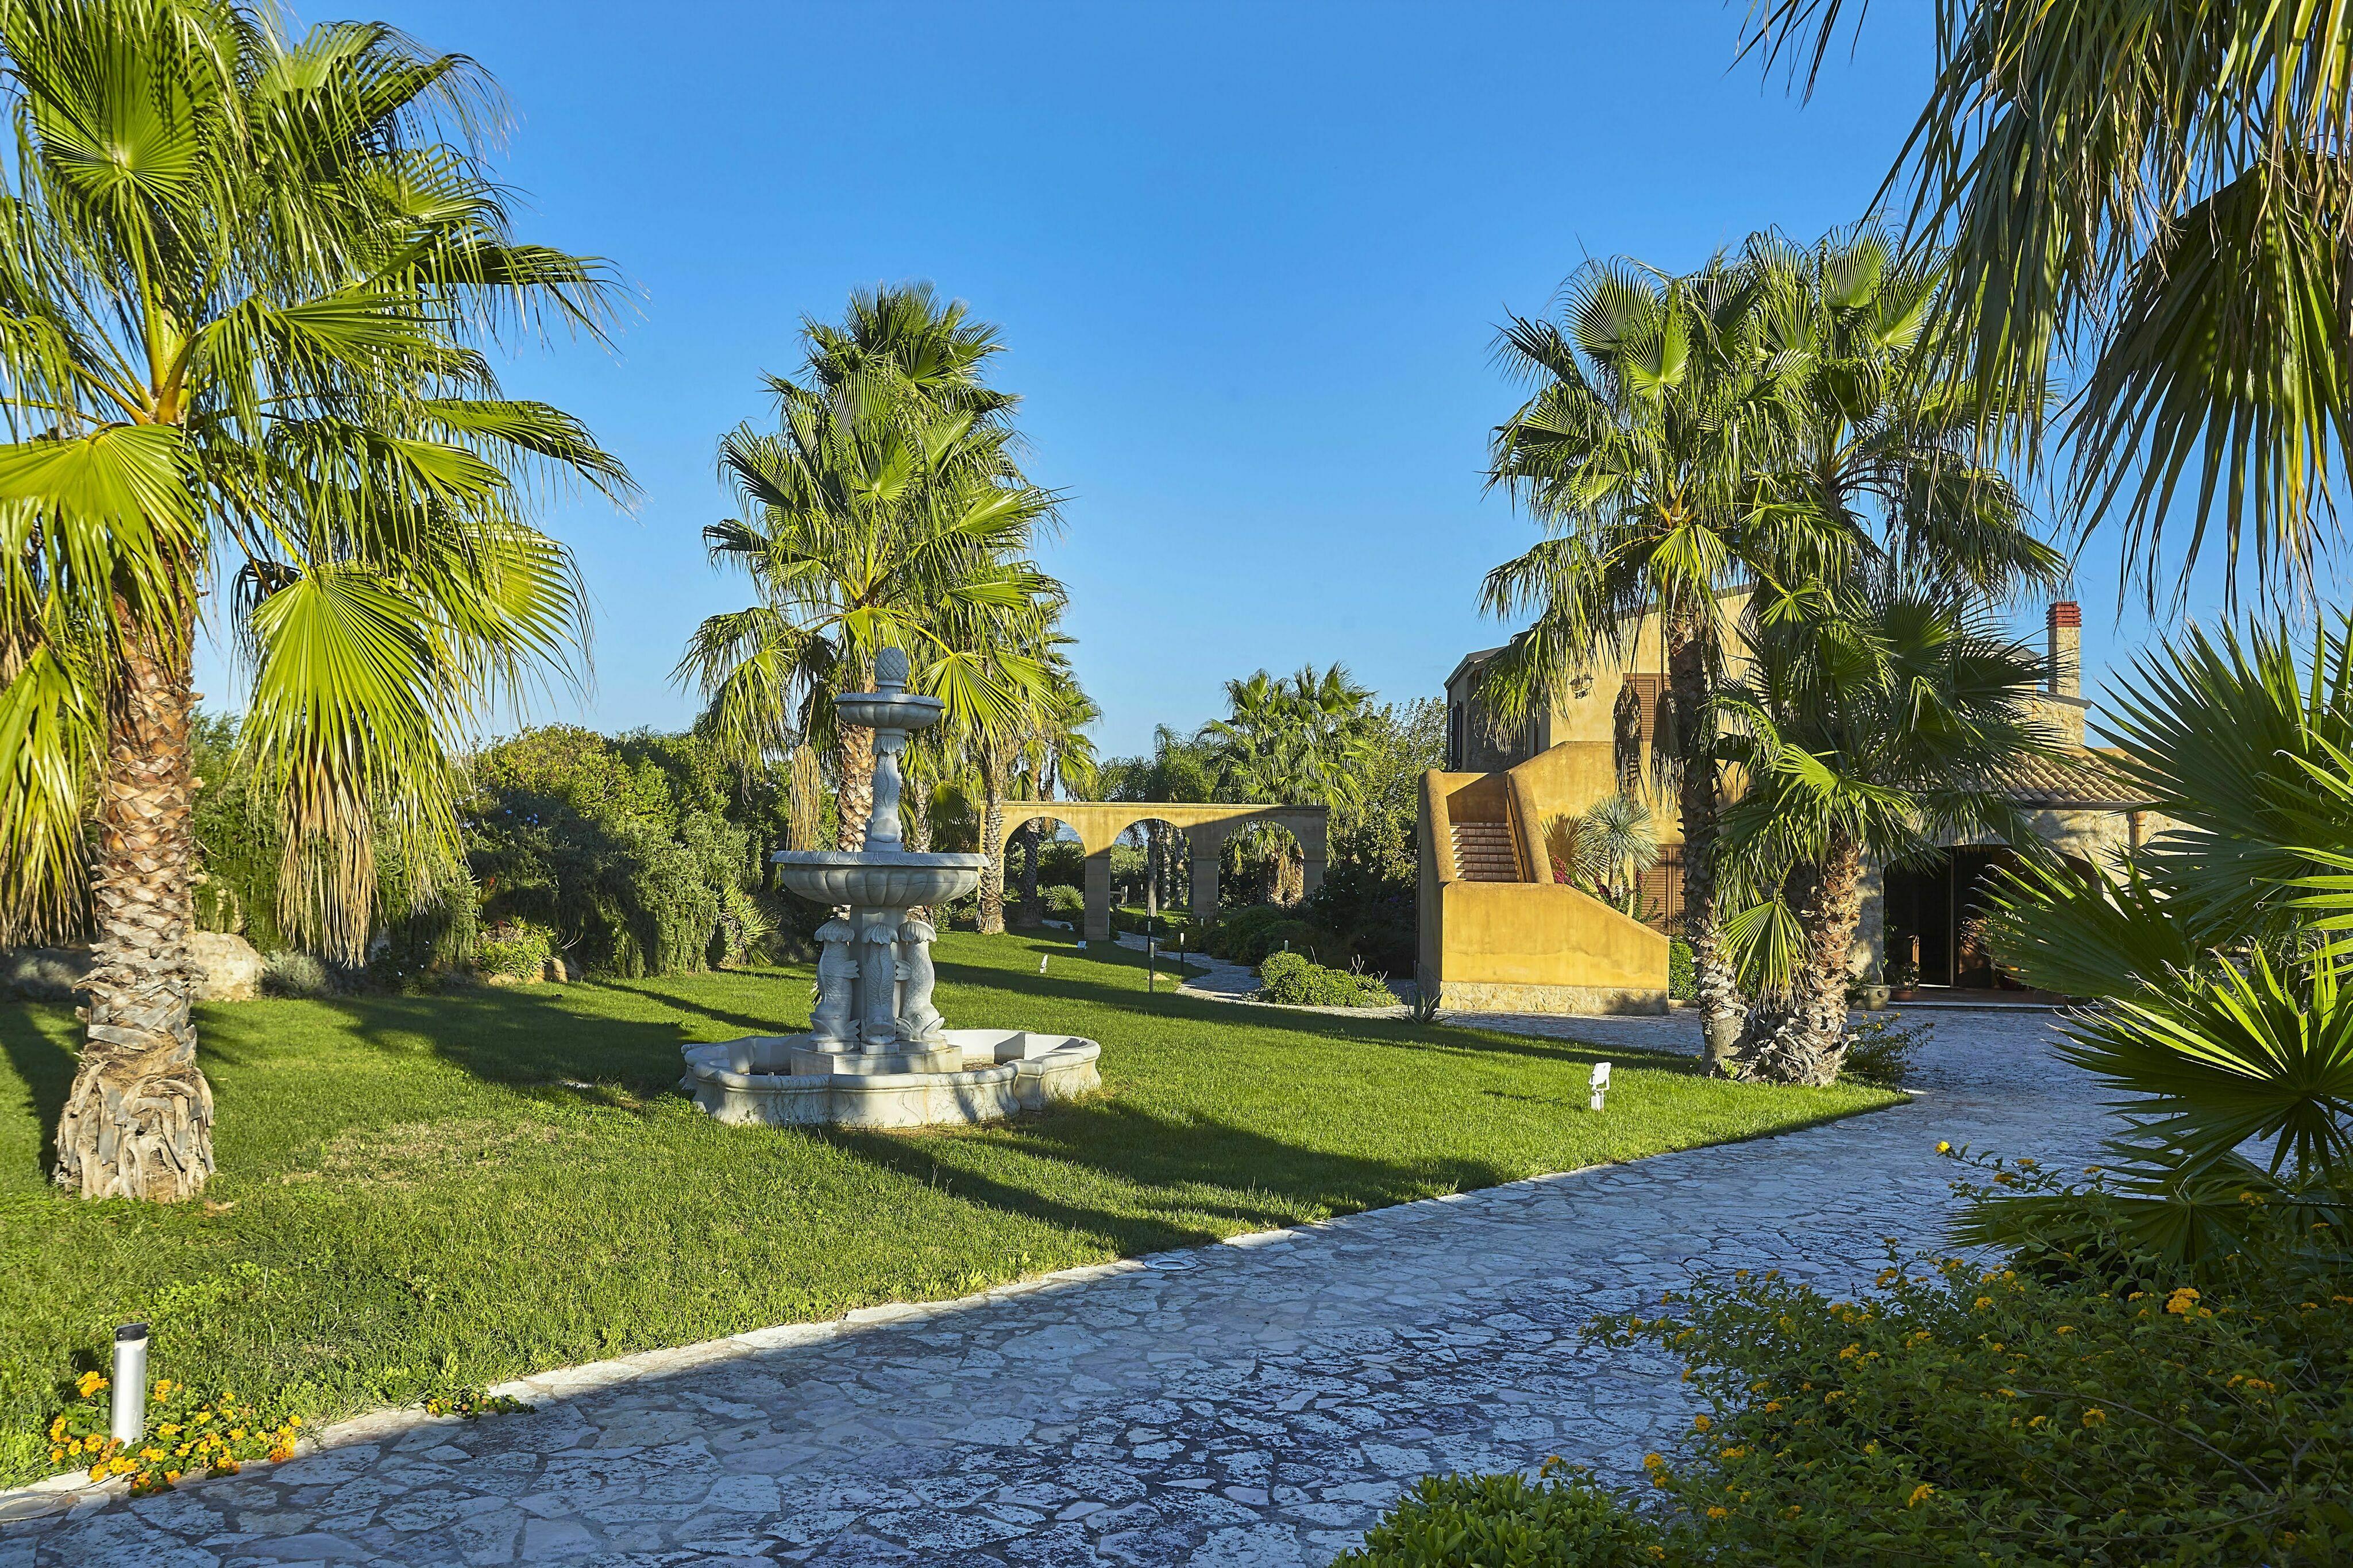 Villa Oasi Triscina